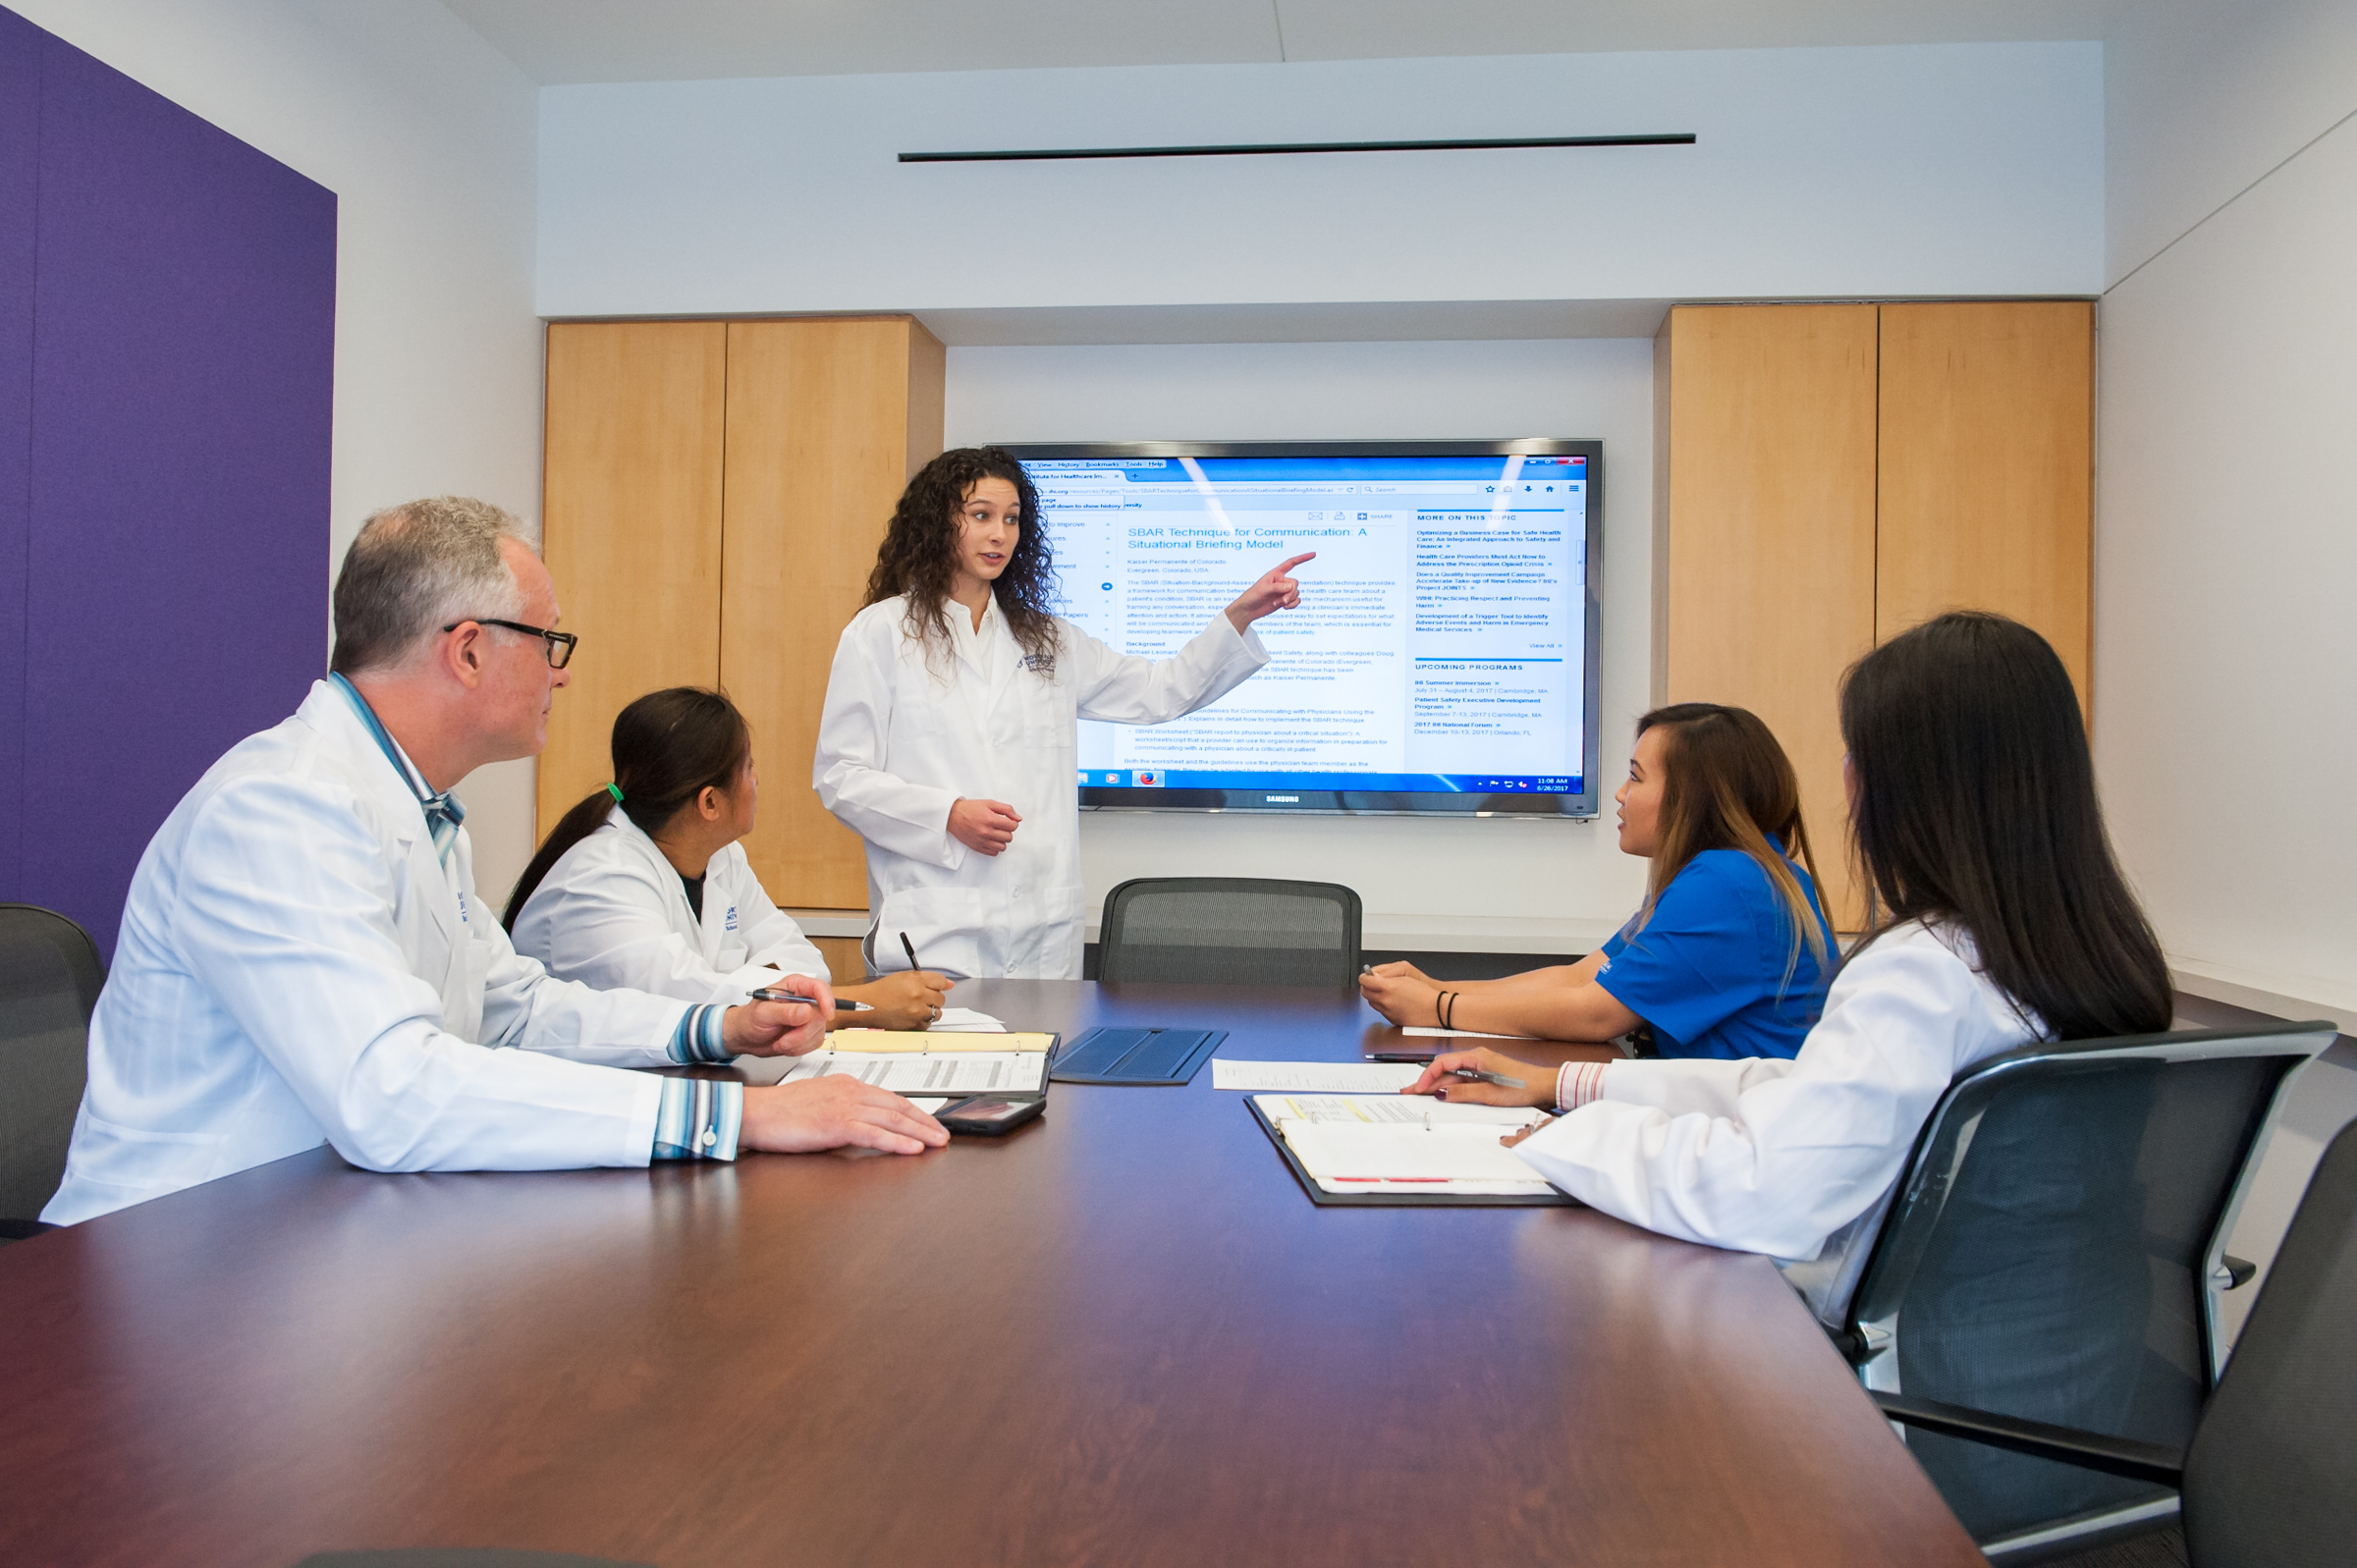 Doctor of Nursing Practice (DNP) Program Requirements featured image background